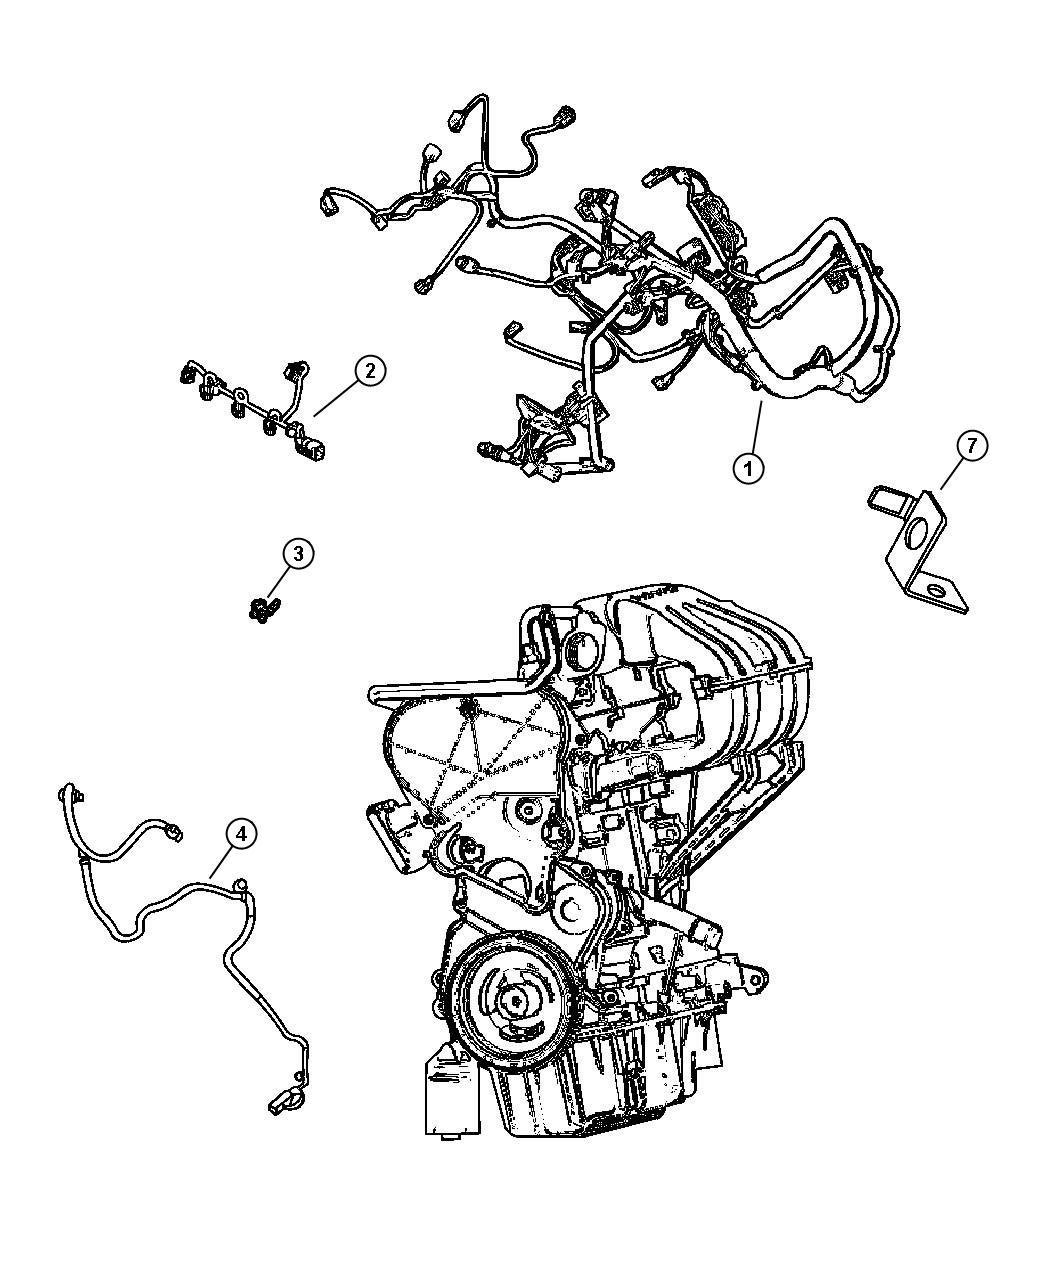 Dodge Grand Caravan Wiring Engine